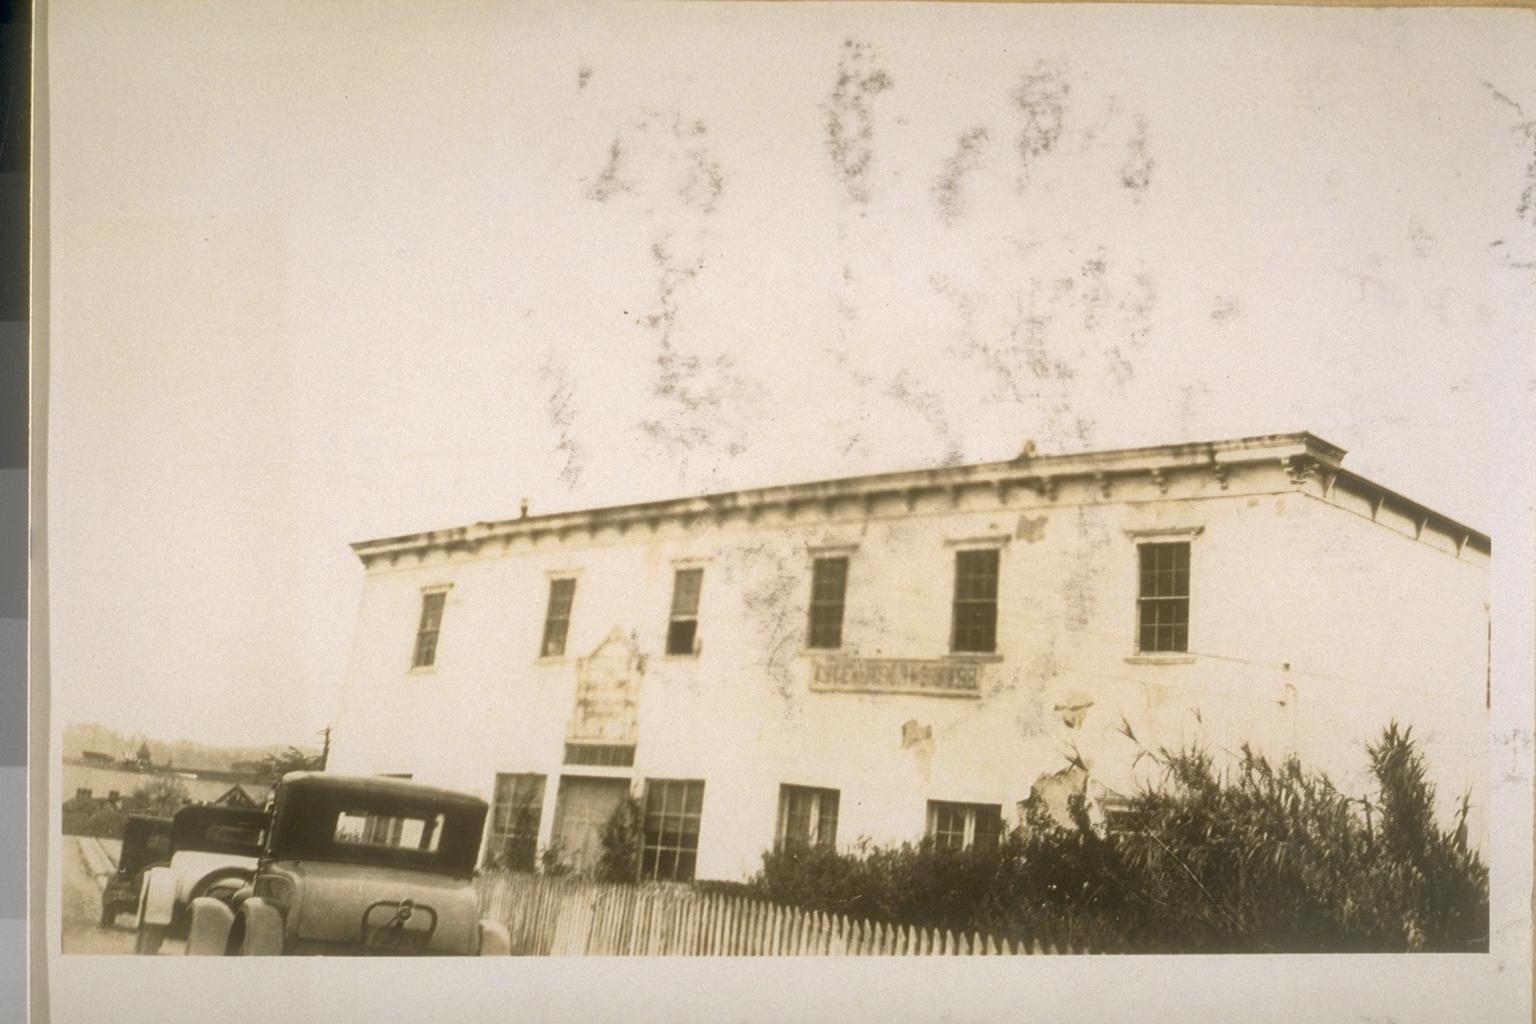 15-a-robert-louis-stevenson-house-monterey